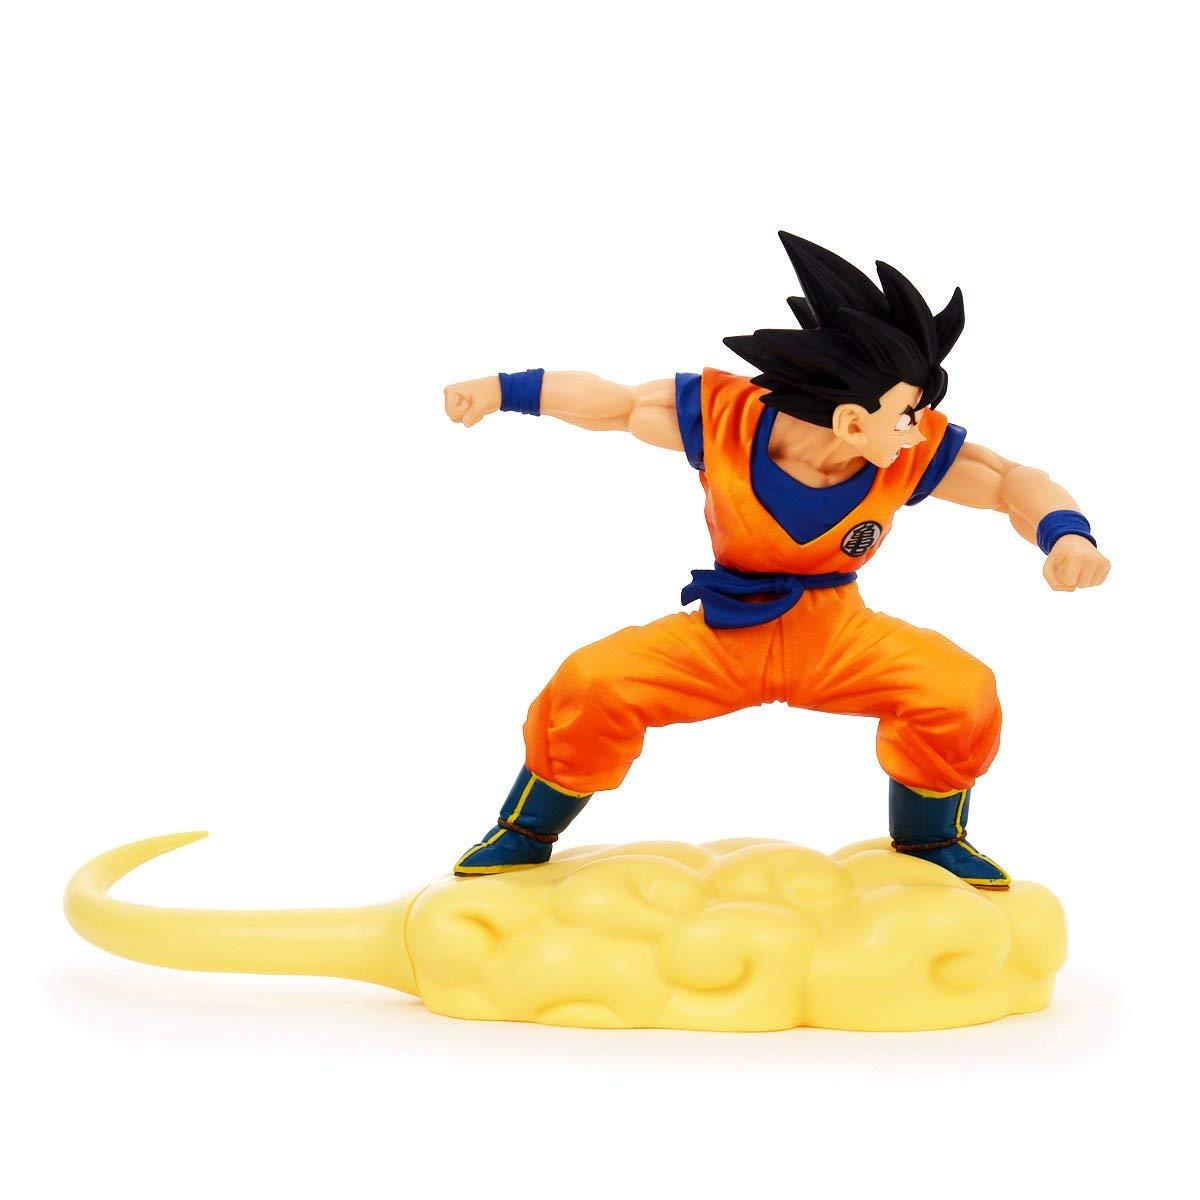 de606213fb66 Amazon.com: Banpresto Dragonball Z Kintoun Figure-Son Goku Adult Prize:  Toys & Games